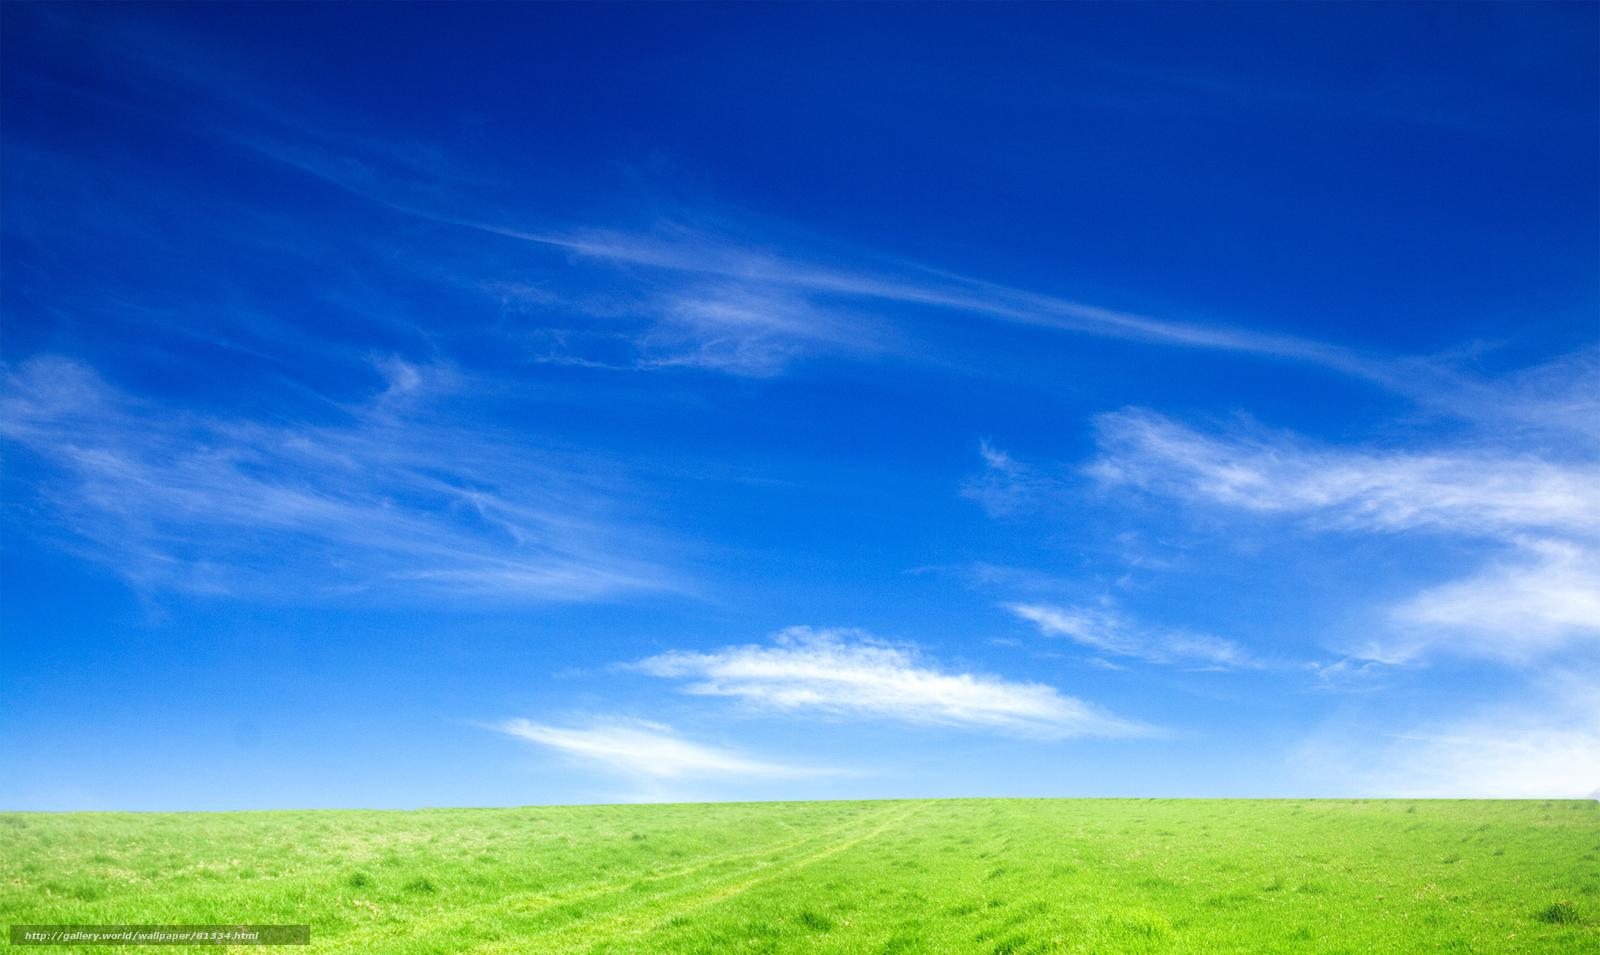 Descargar gratis Paisajes,  Papel pintado,  Naturaleza,  cielo Fondos de escritorio en la resolucin 2100x1254 — imagen №81334